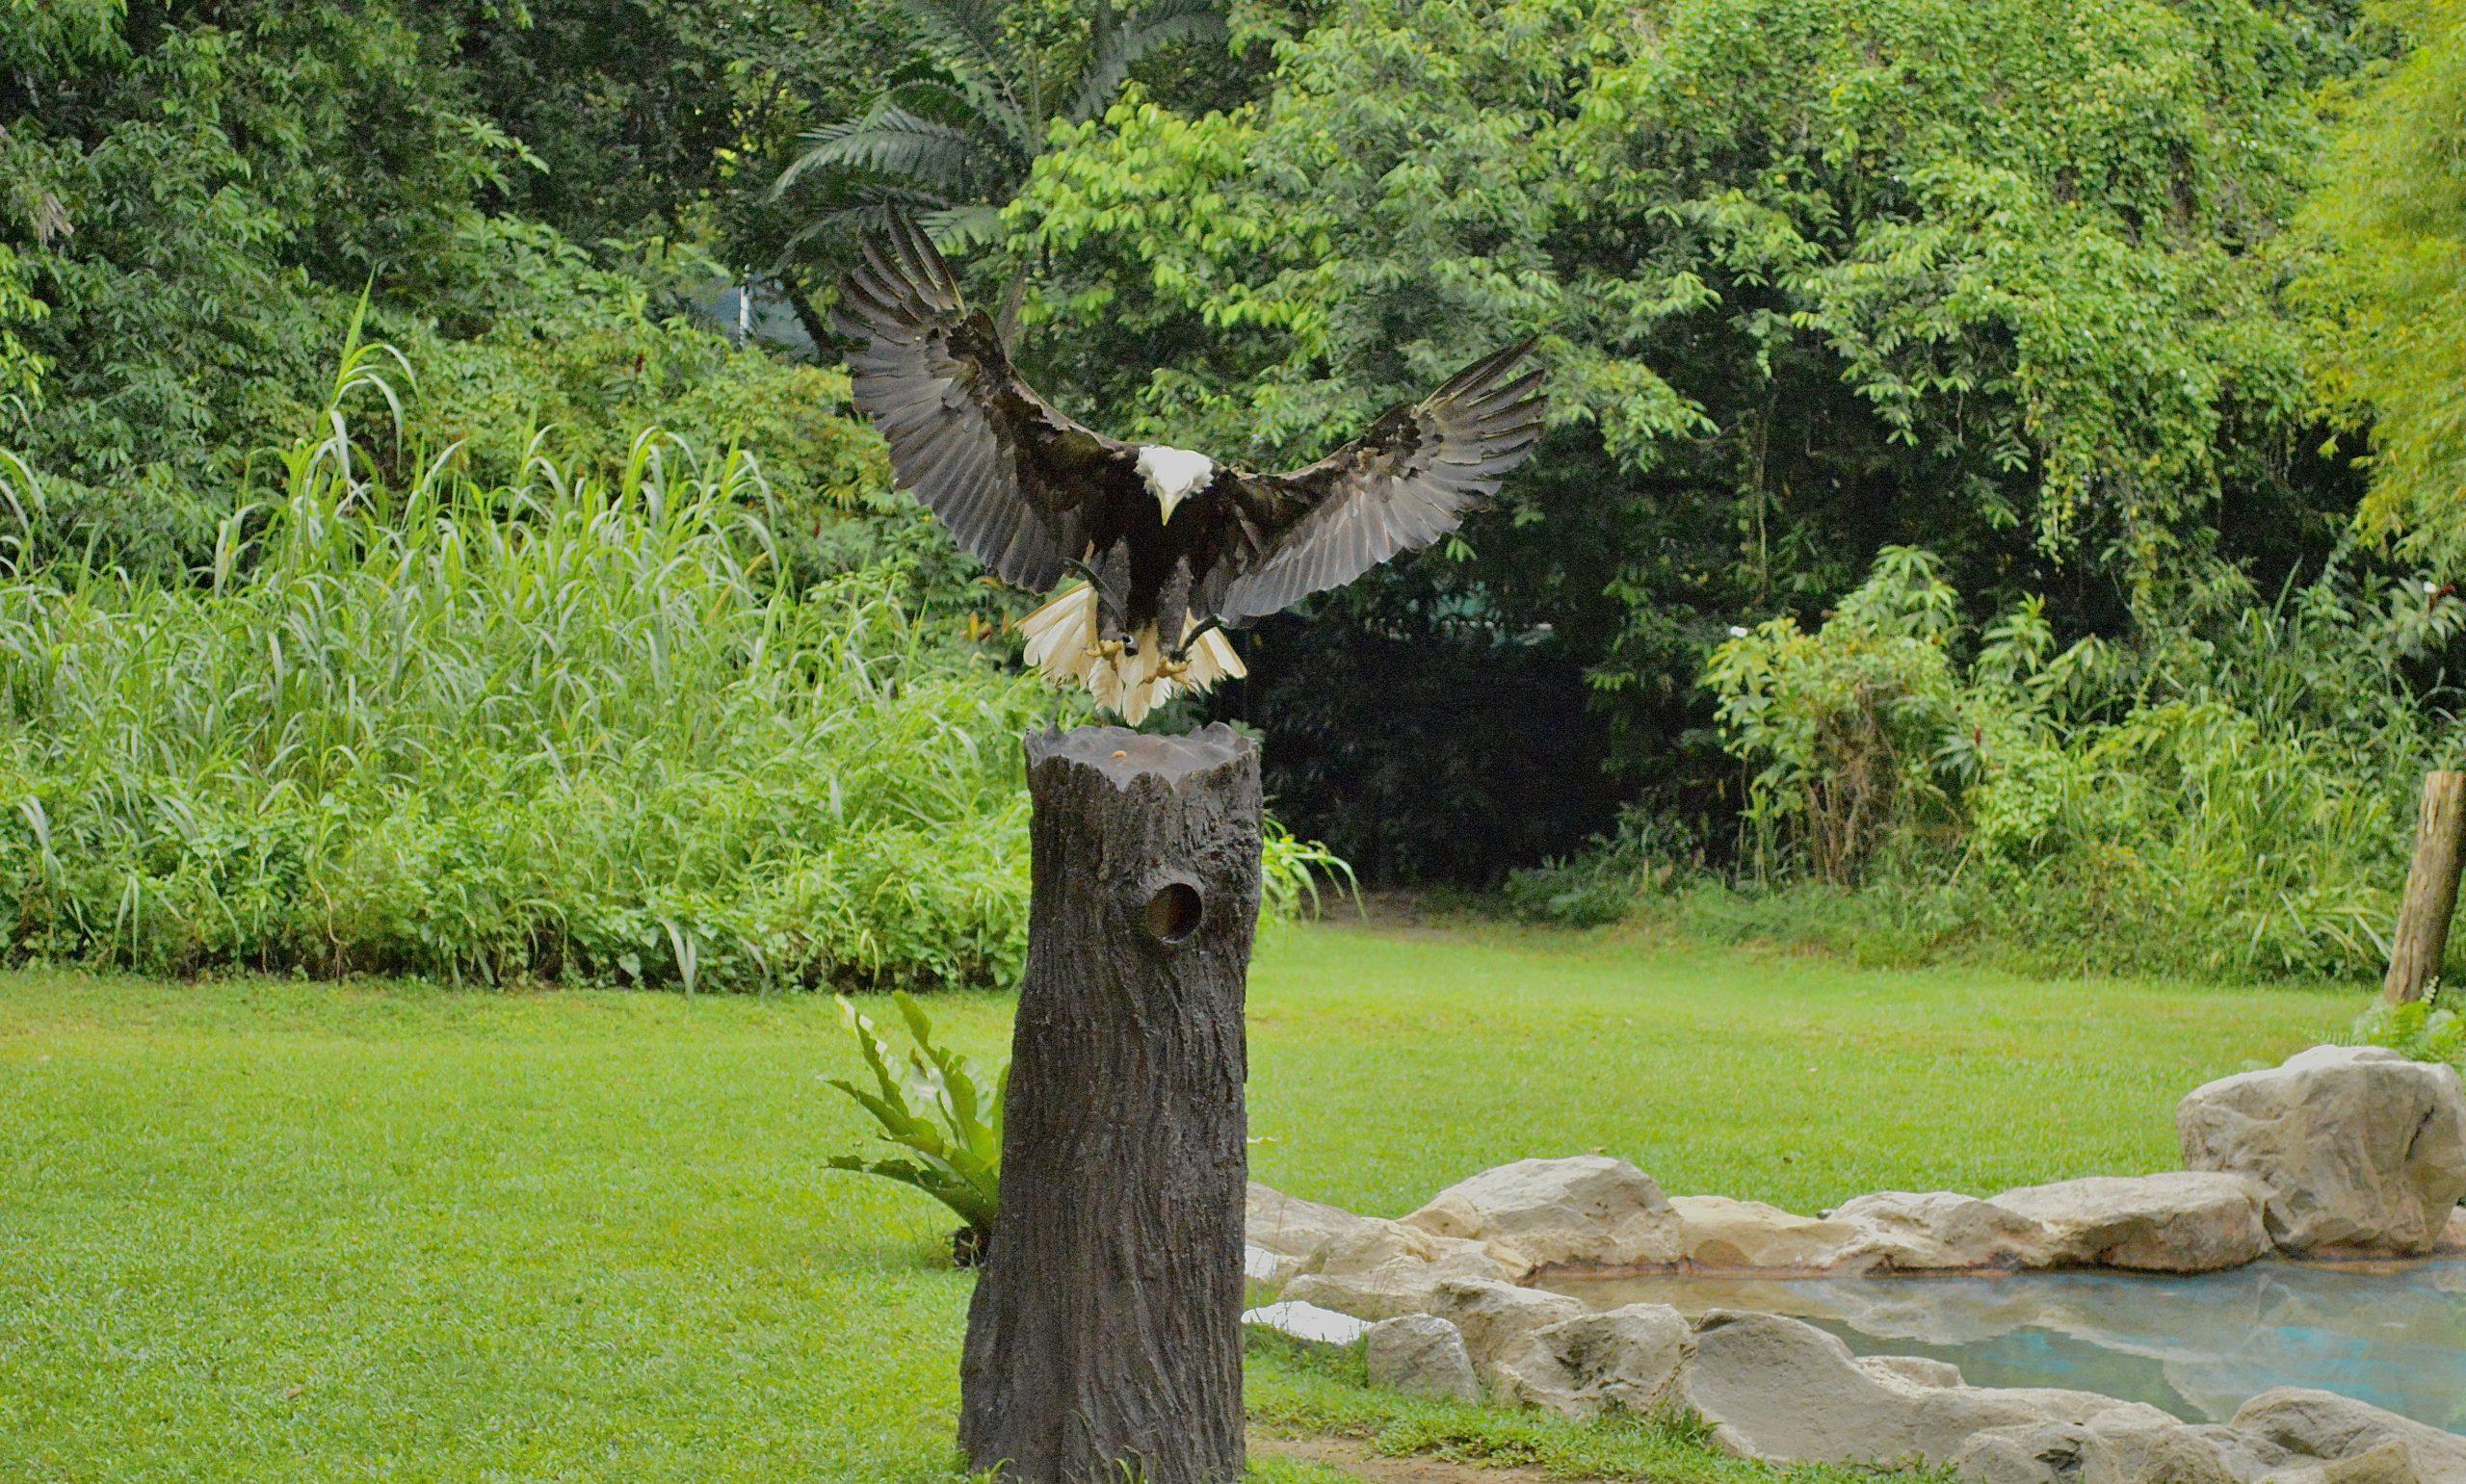 Eagle landing on wooden pole